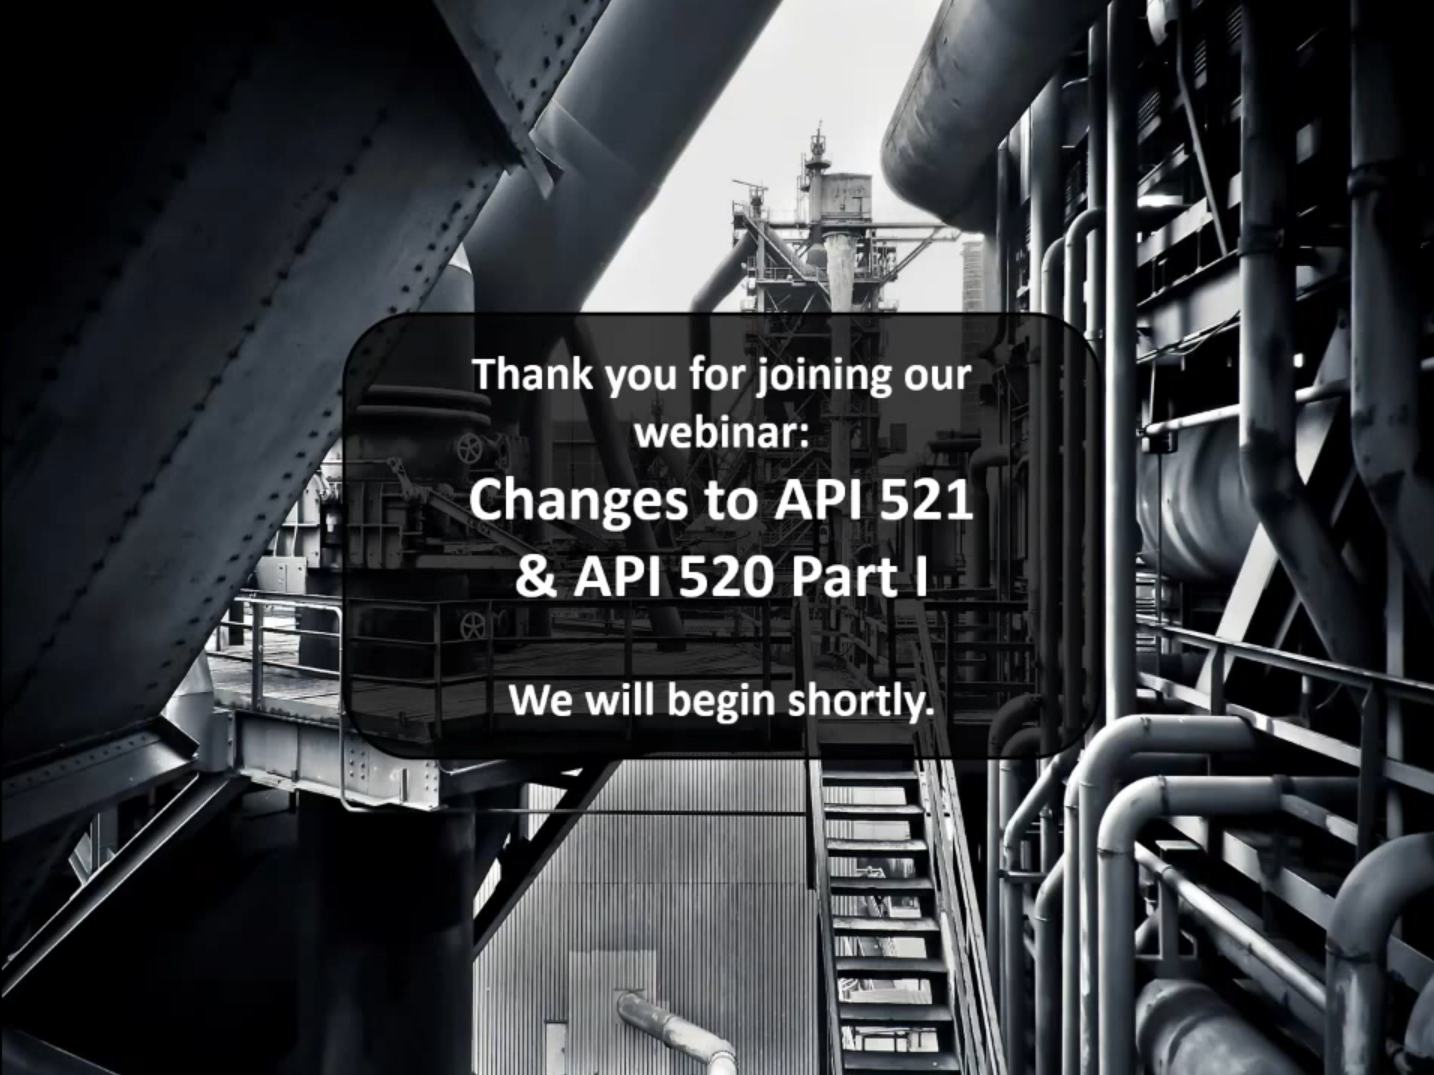 Changes to API 520 Pt I & 521